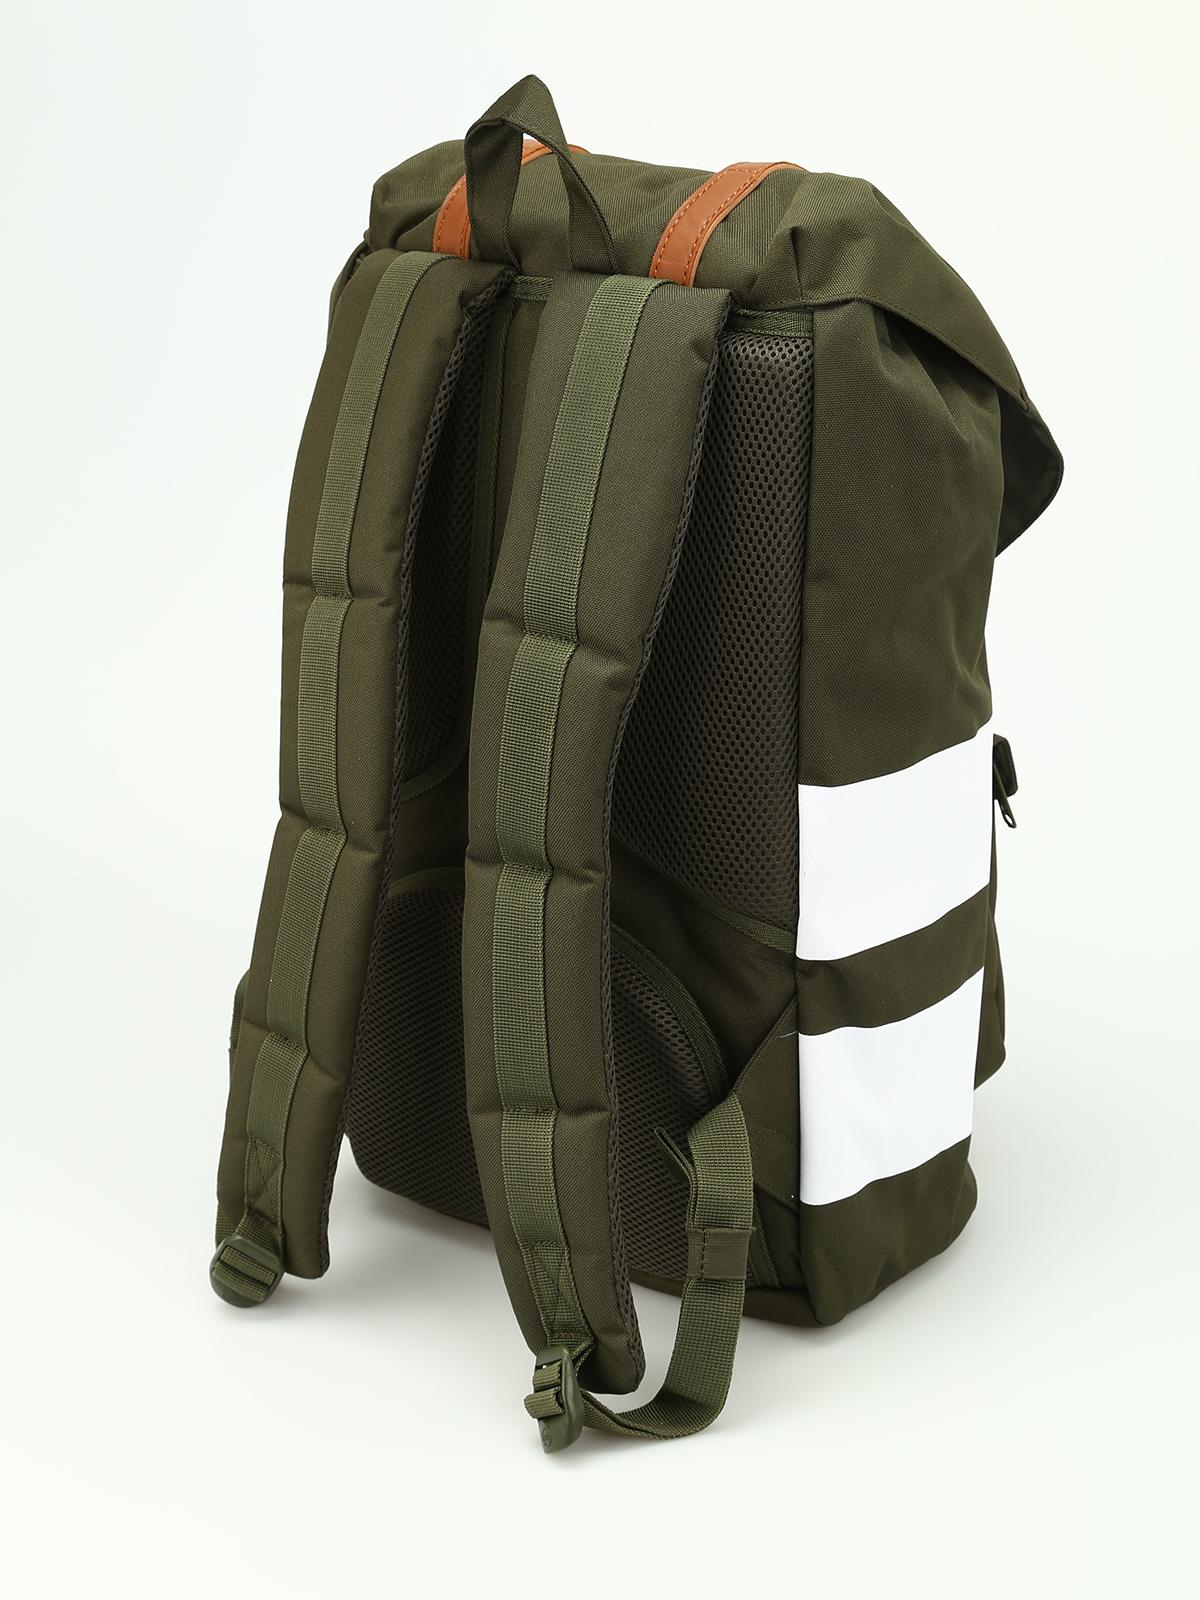 Herschel - Little America backpack - backpacks - 10014 01597 OS 8008307596